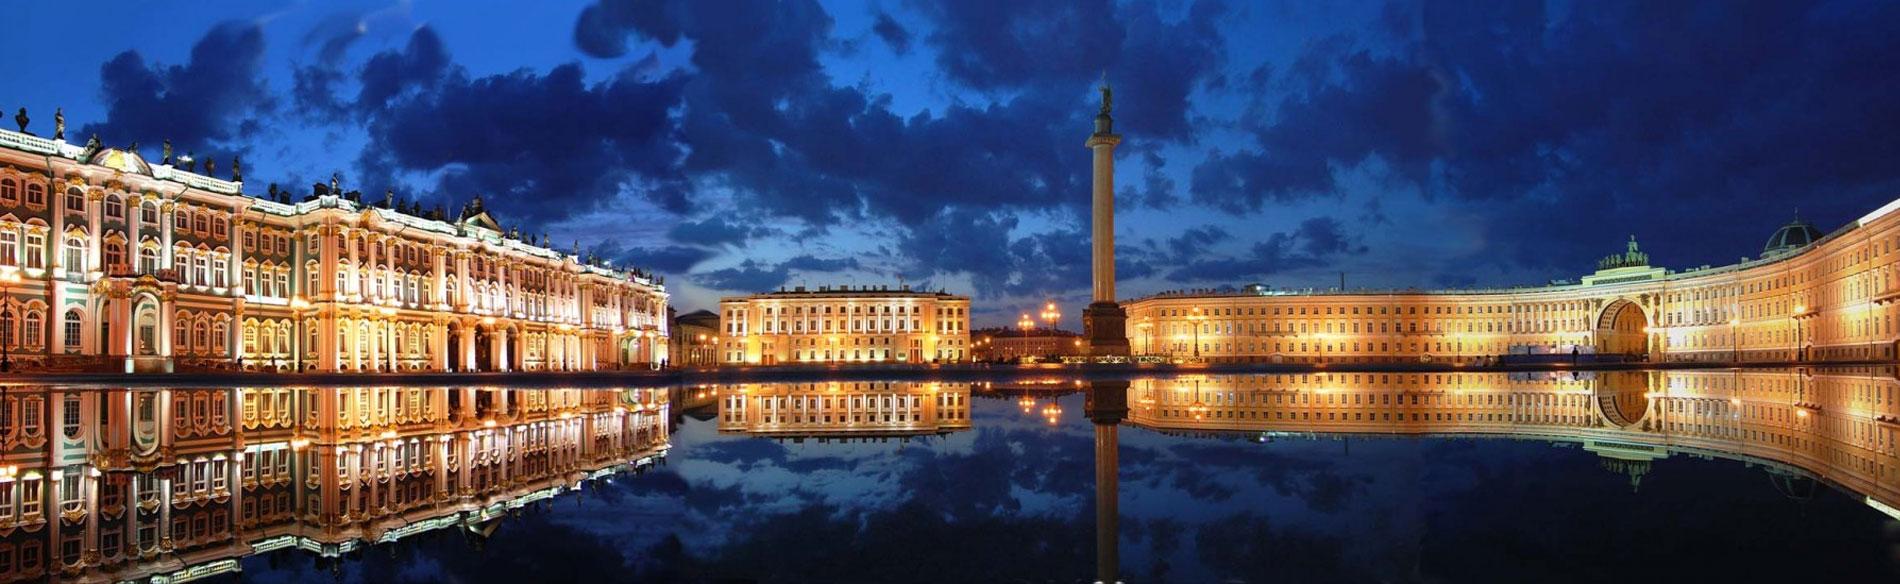 Tours in Saint Petersburg